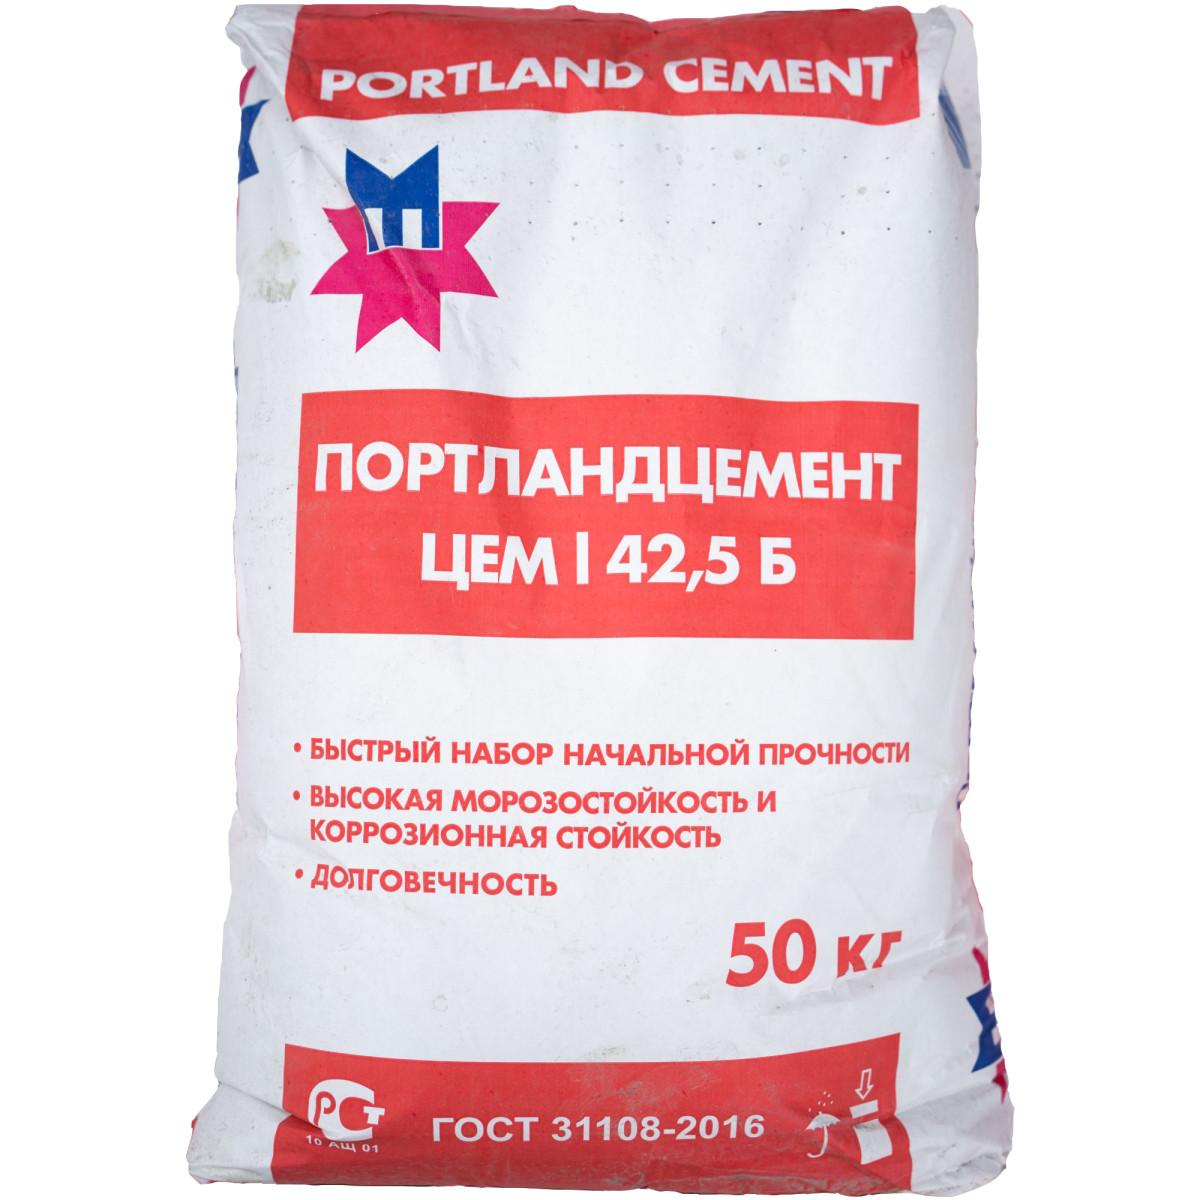 Цемент Мордовцемент М500 ЦЕМ I 42.5 Б 50 кг